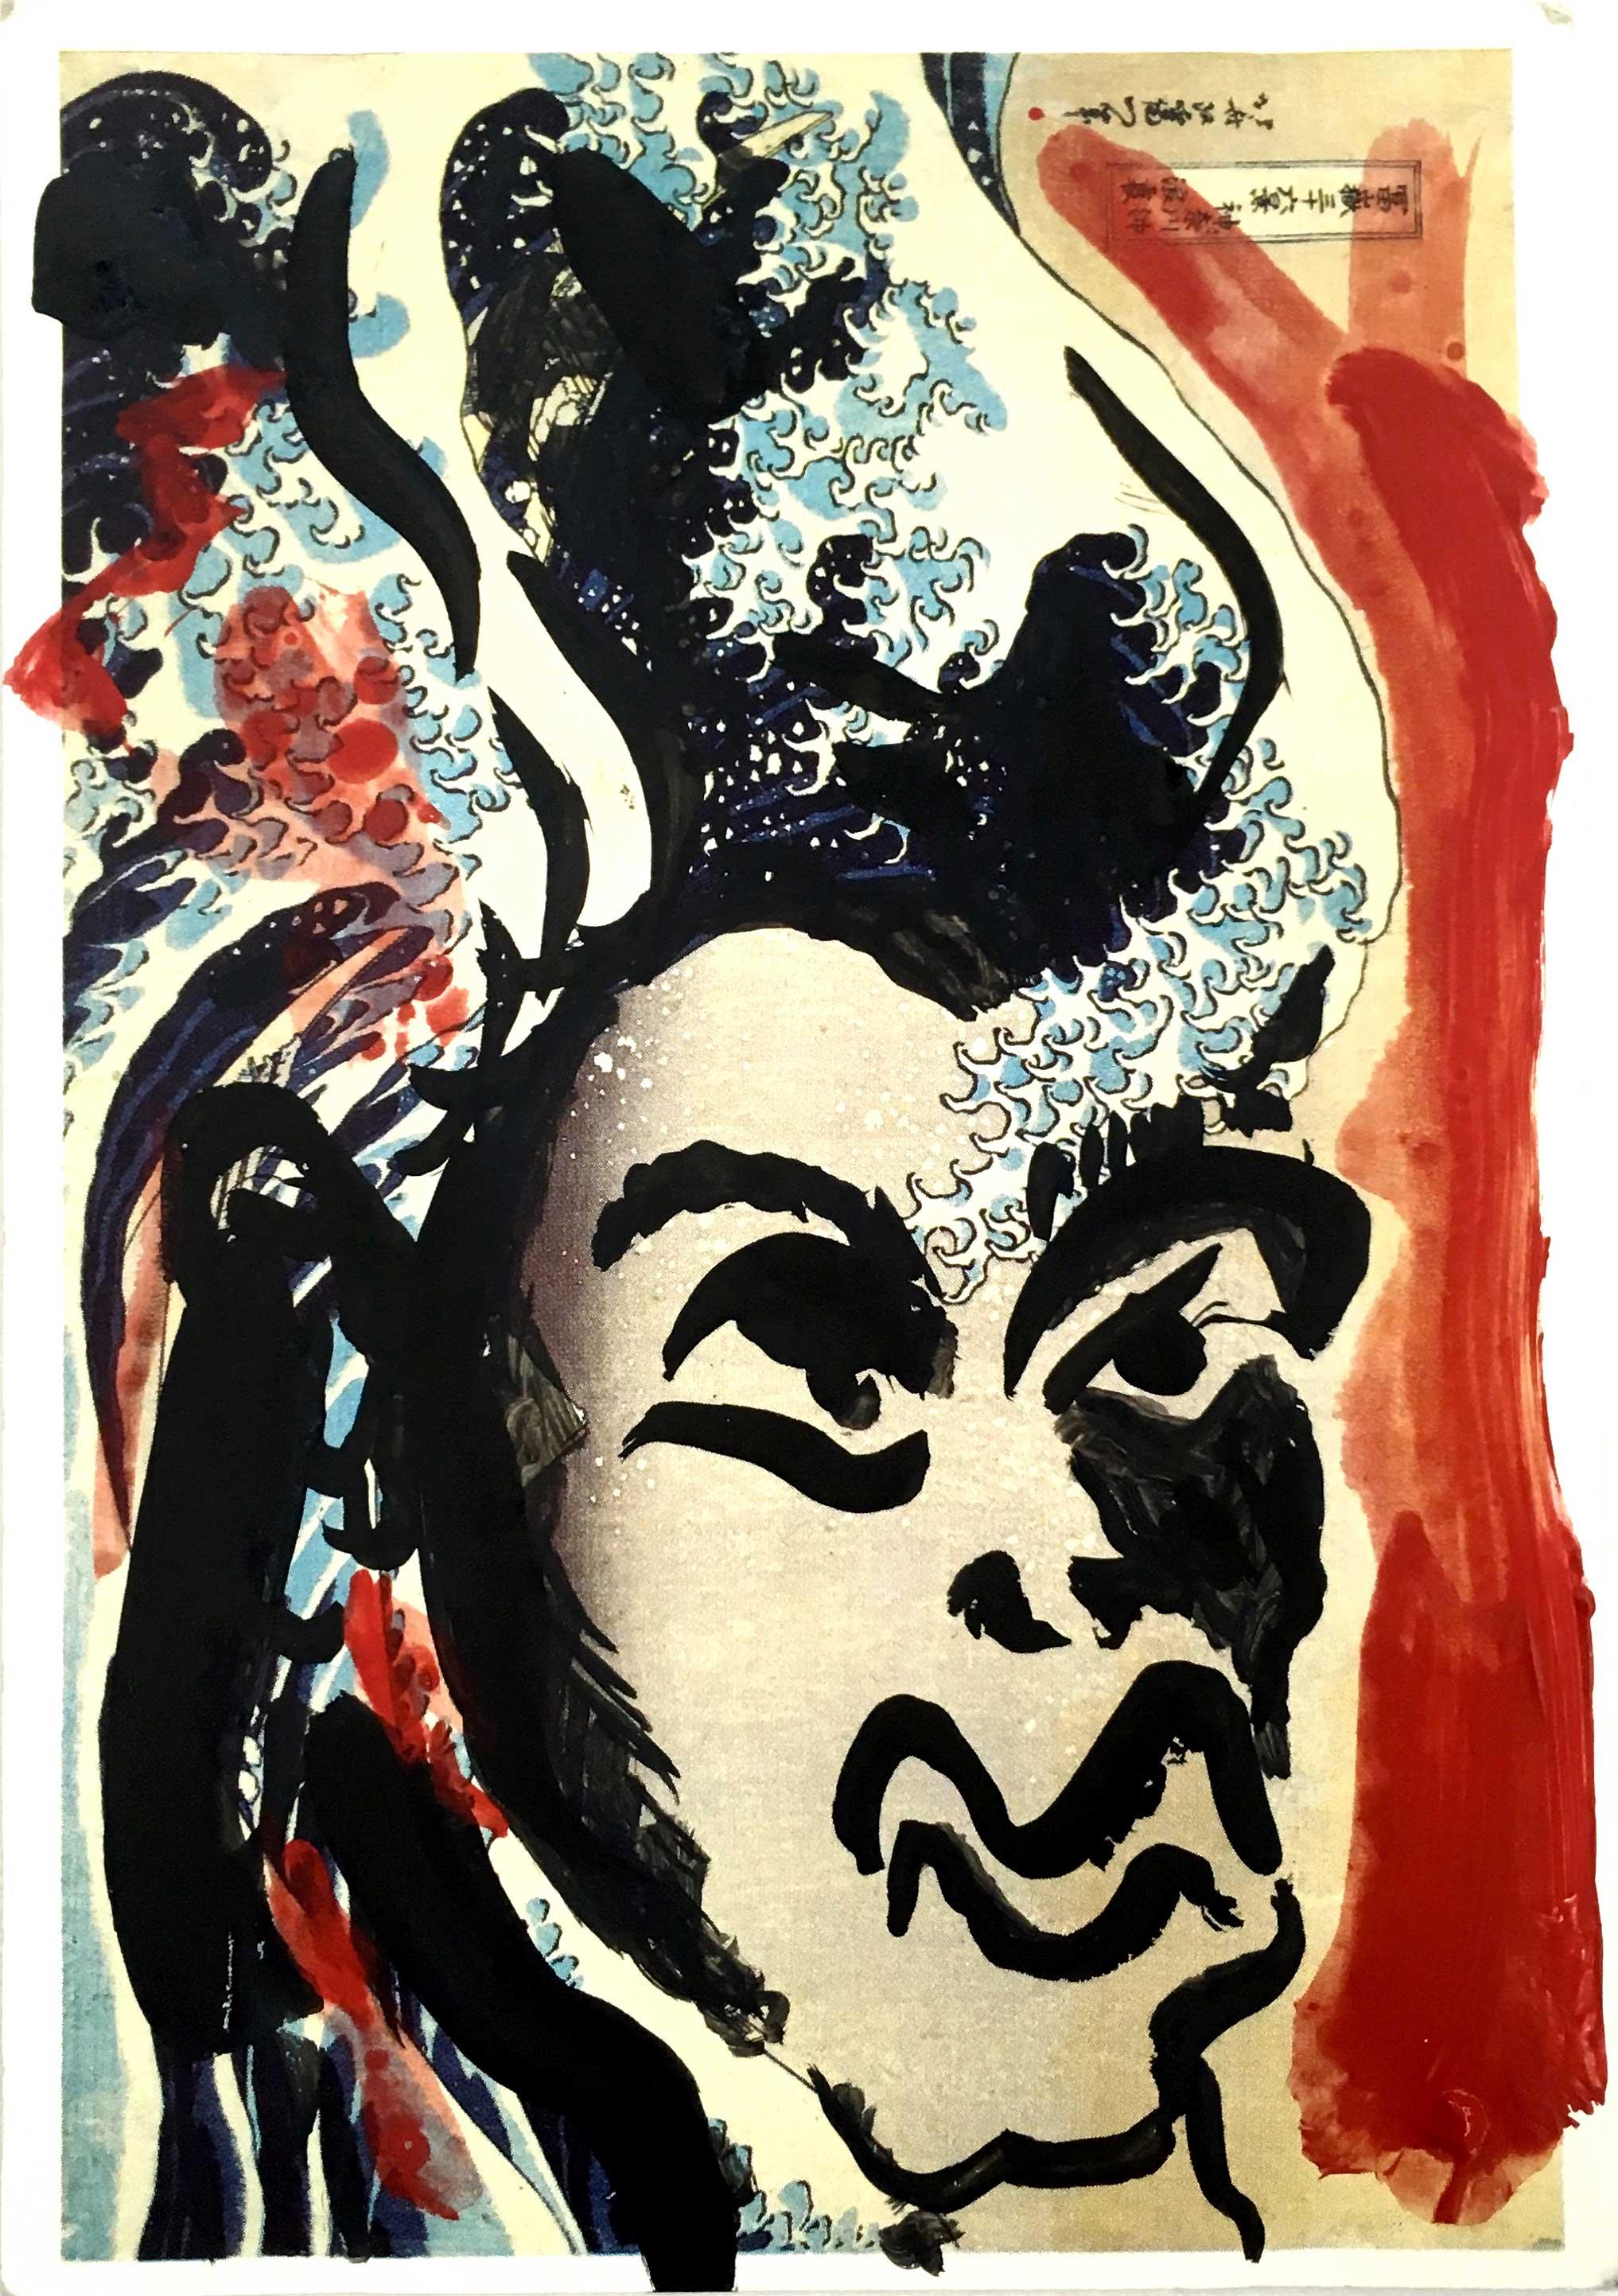 Xavier Noiret-Thomé, Painting on postcard, 2019